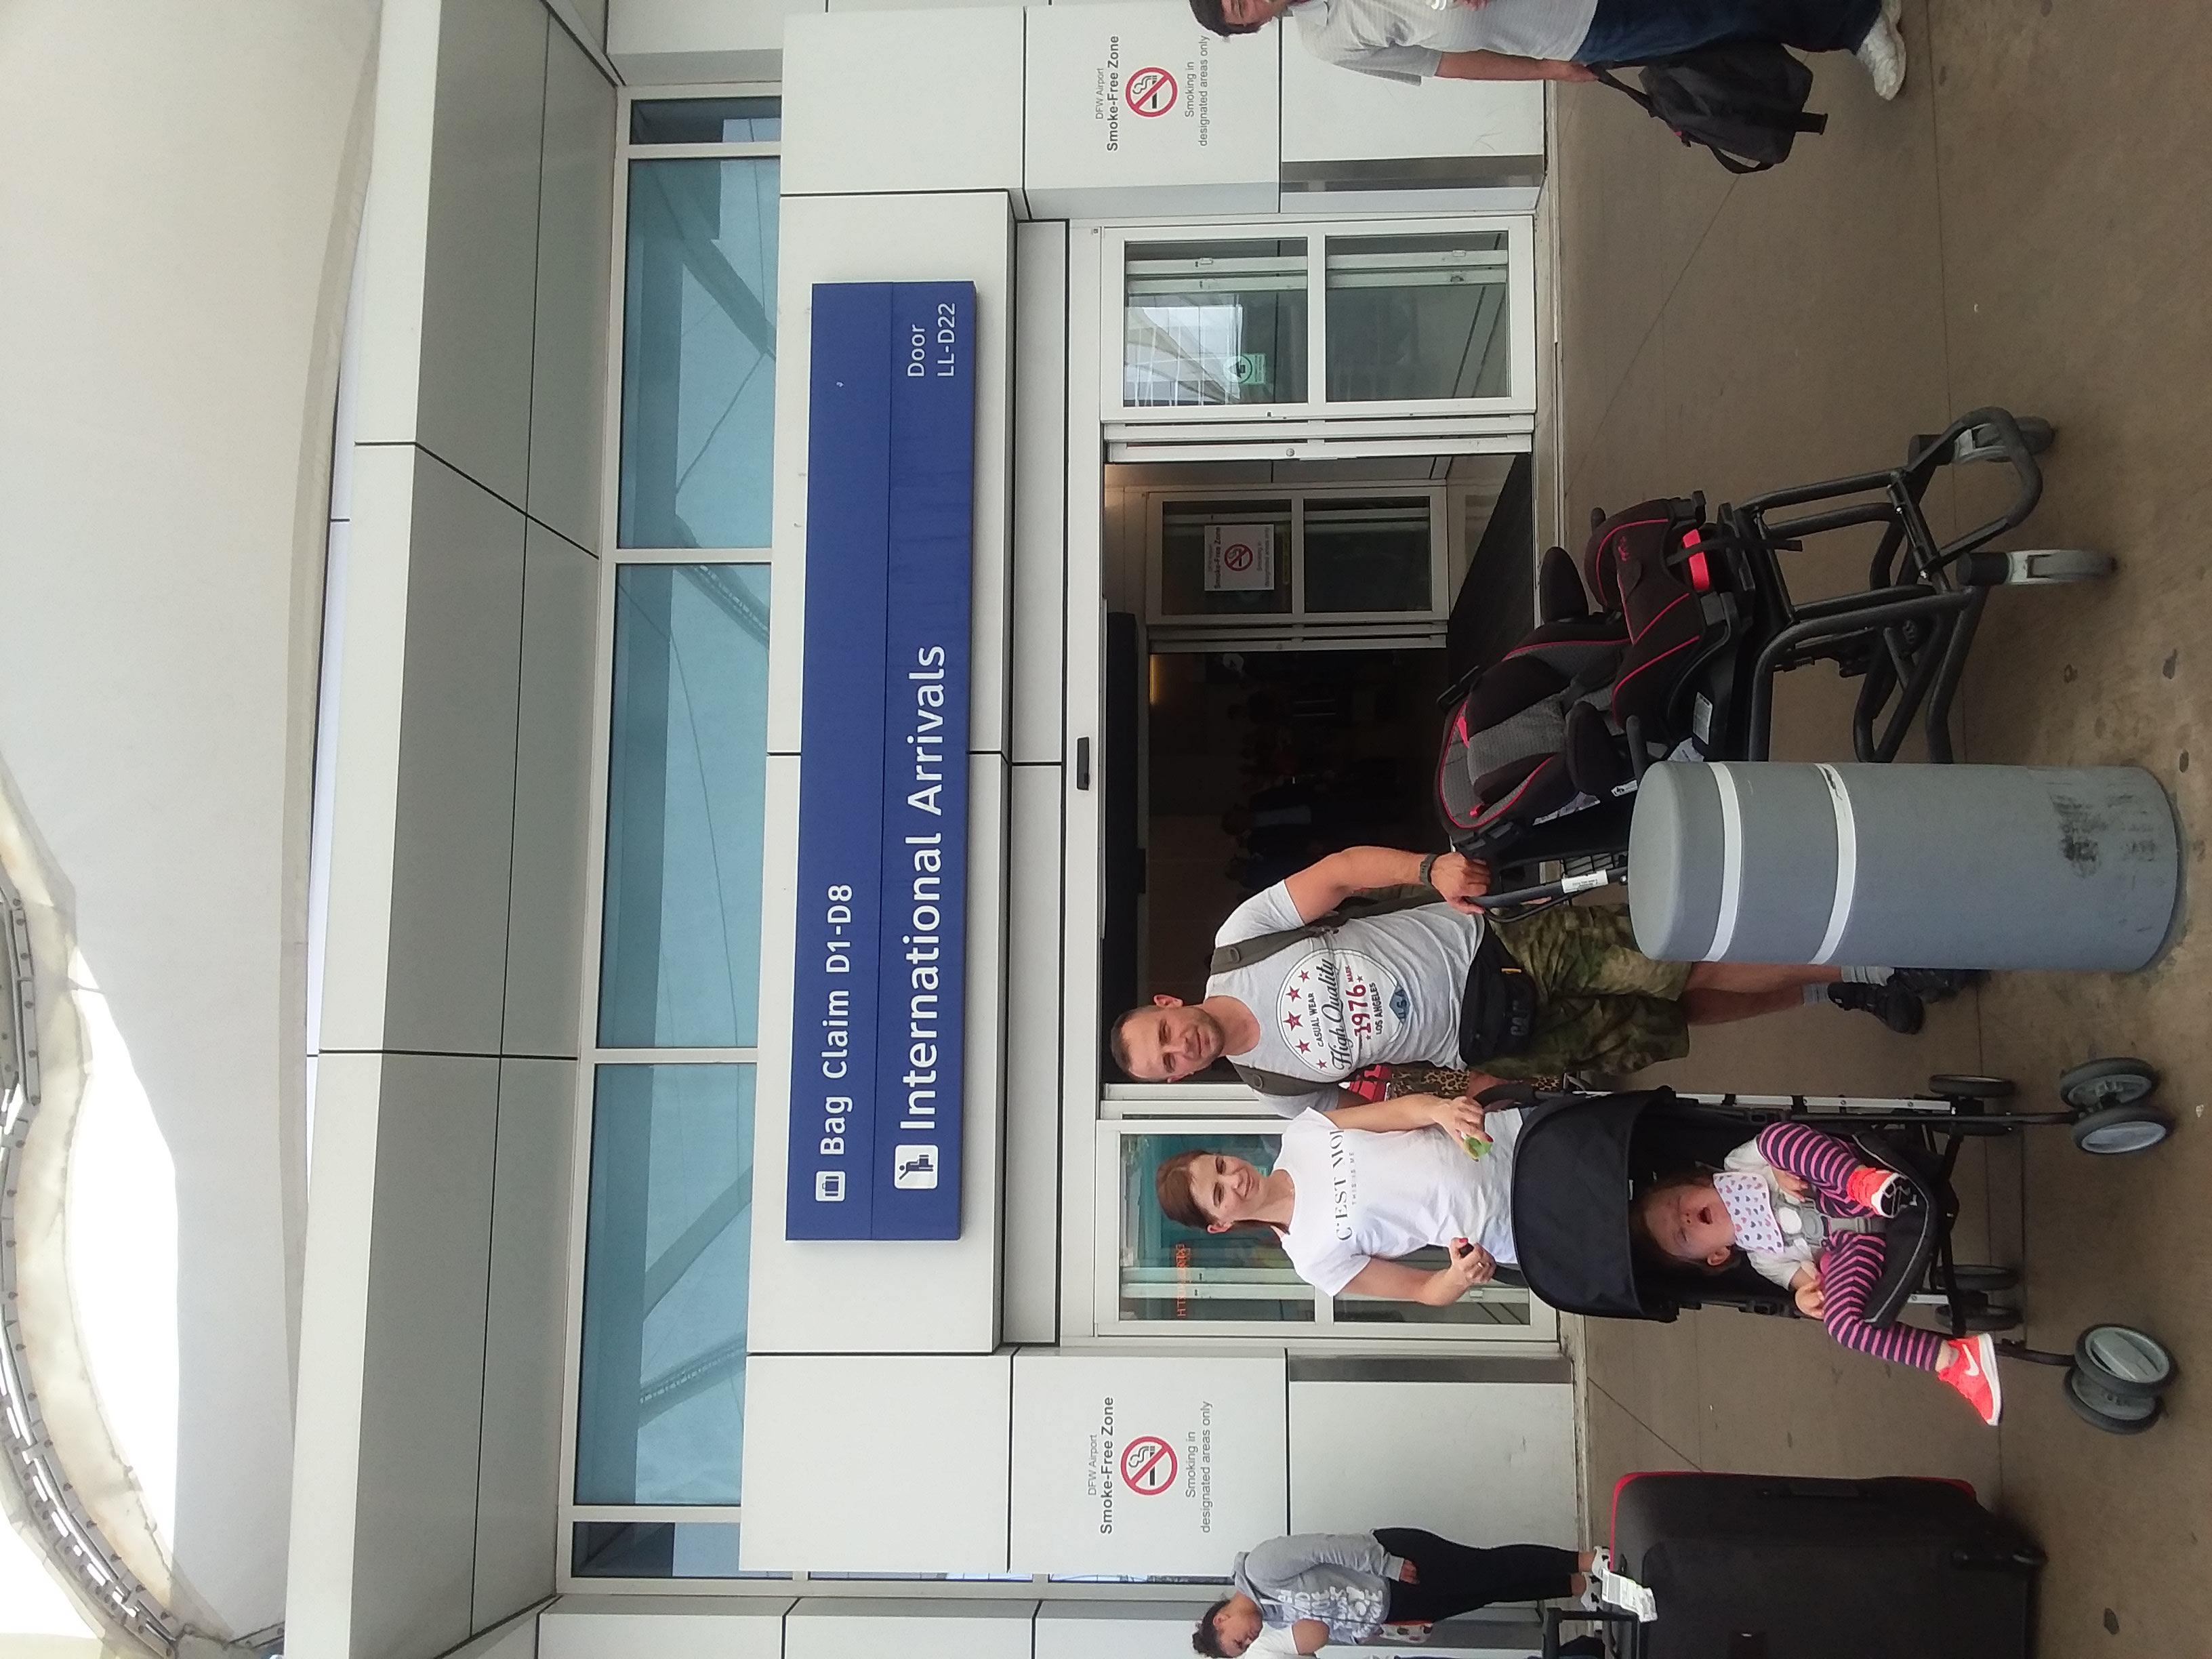 DFW Airoport - Matuszewski familly arrived_